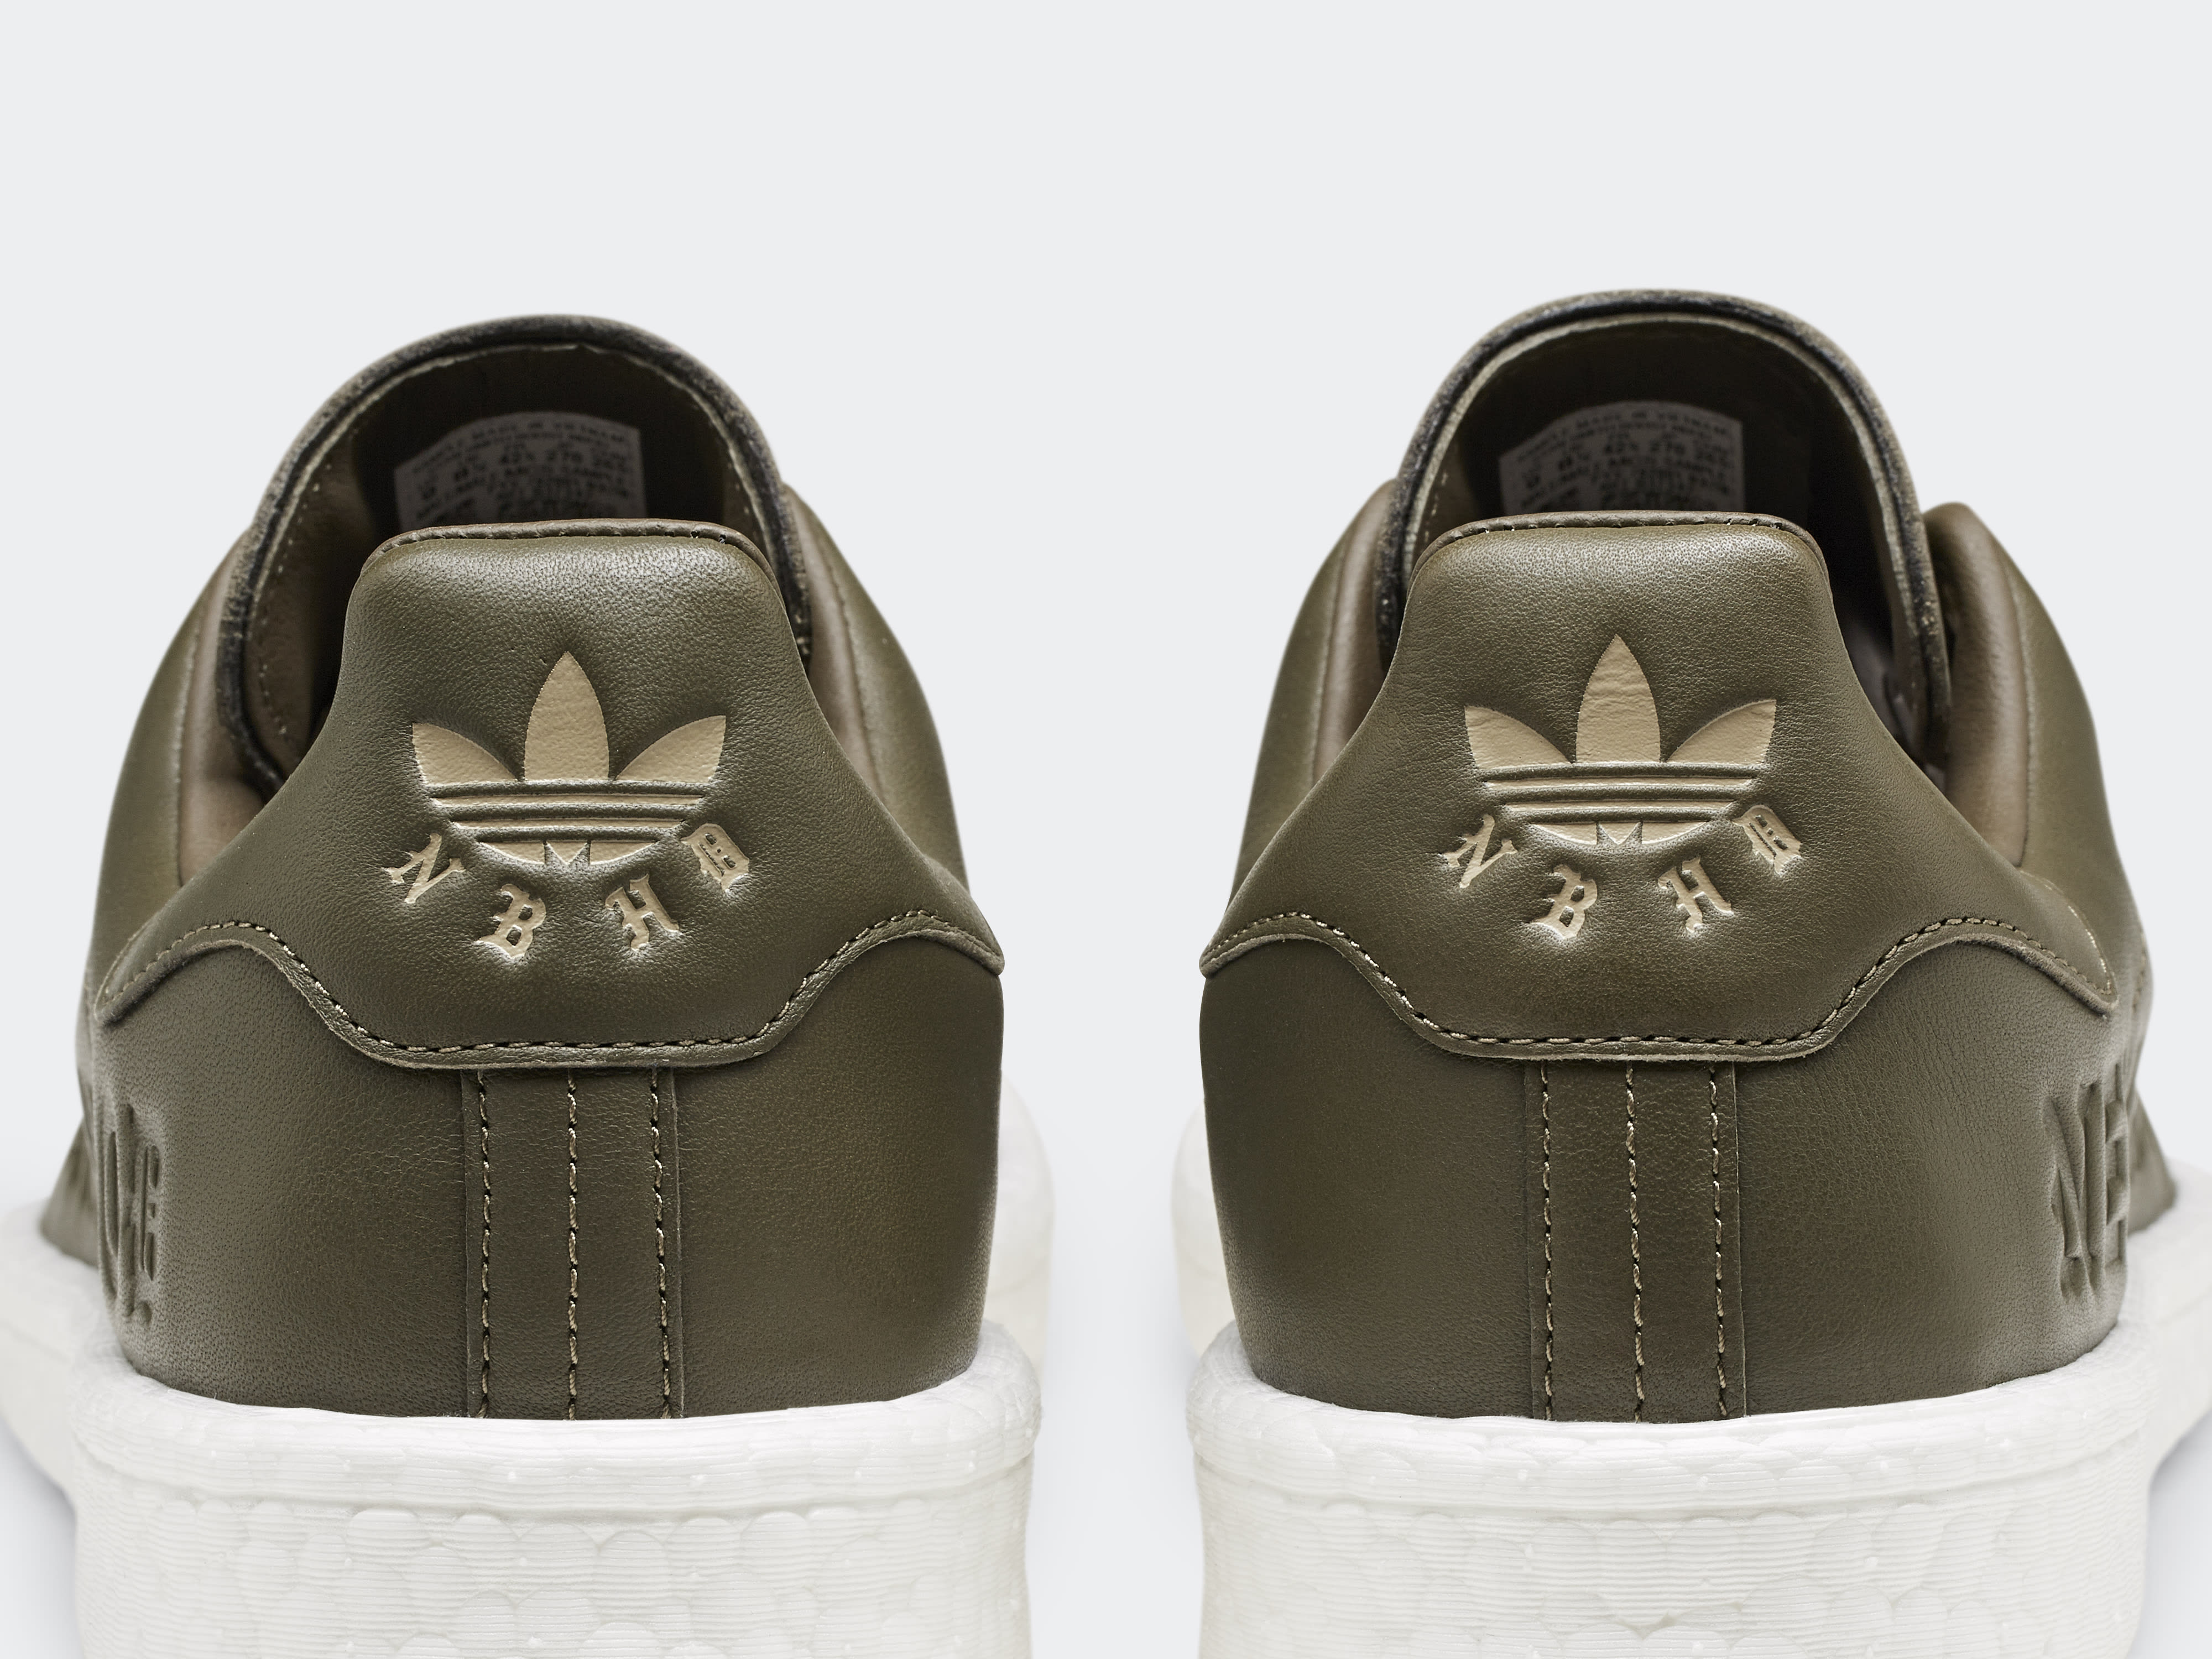 Neighborhood x Adidas Stan Smith Boost B37342 (Heel)